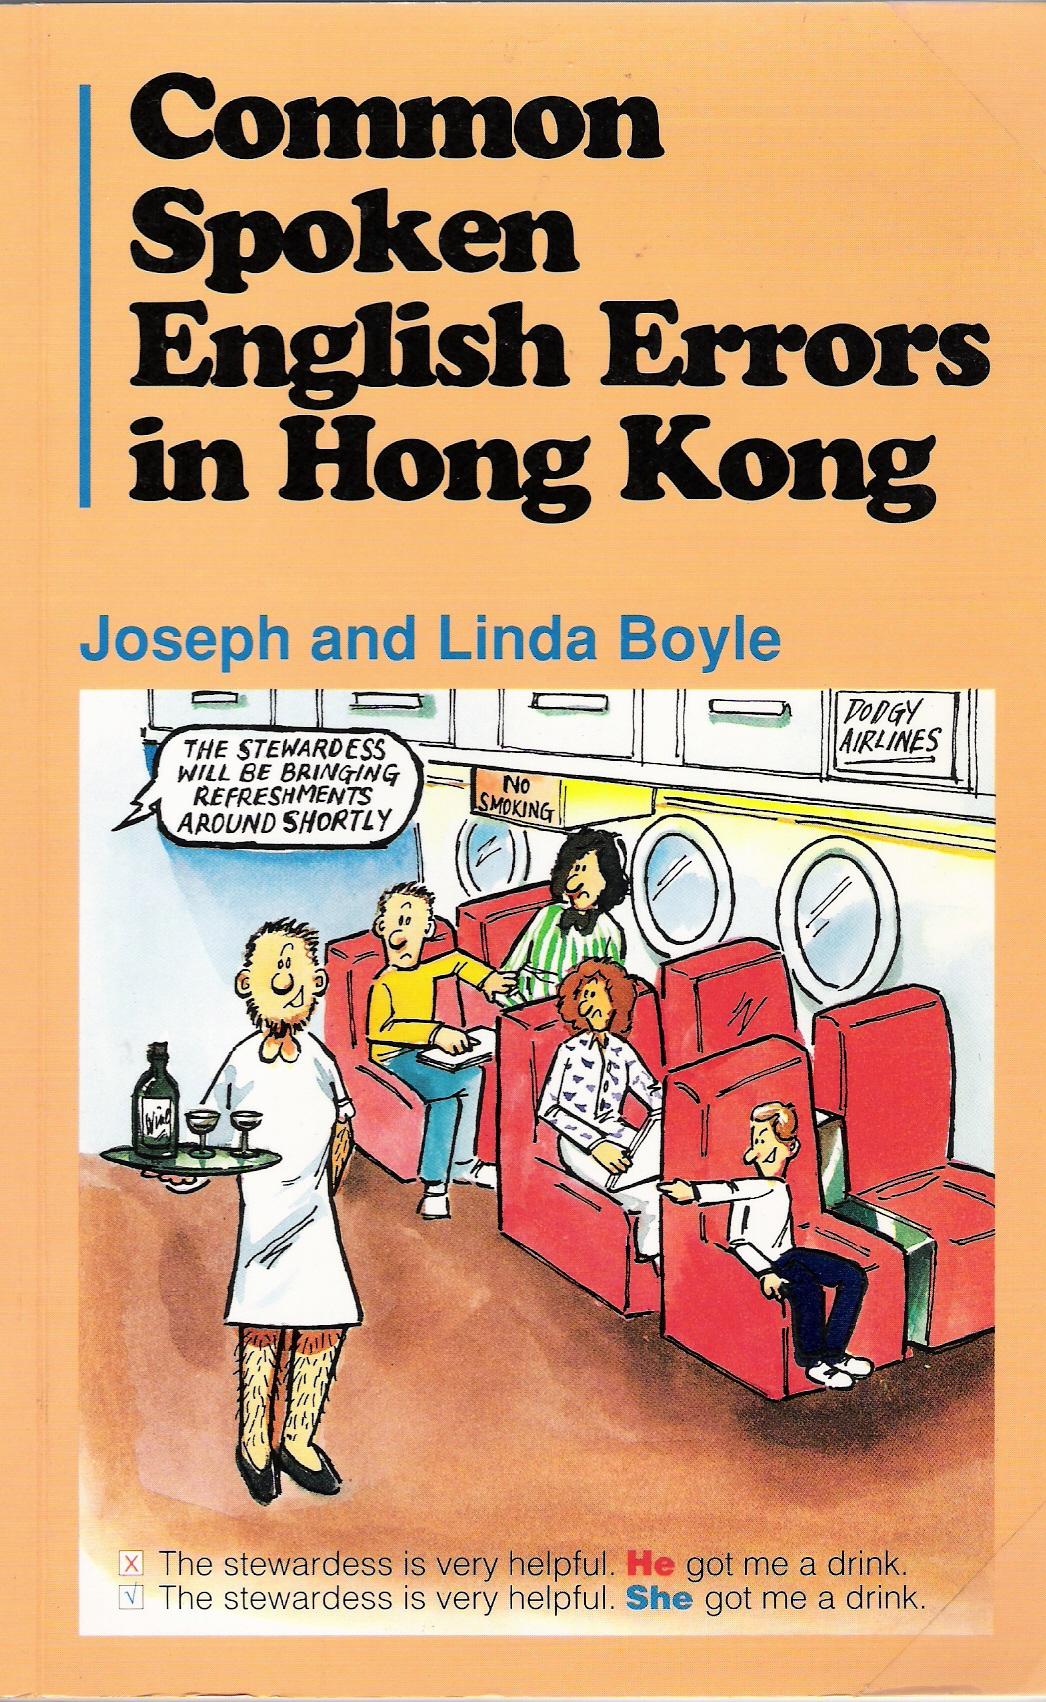 common spoken english errors in hong kong joseph boyle linda boyle reviews on anobii. Black Bedroom Furniture Sets. Home Design Ideas